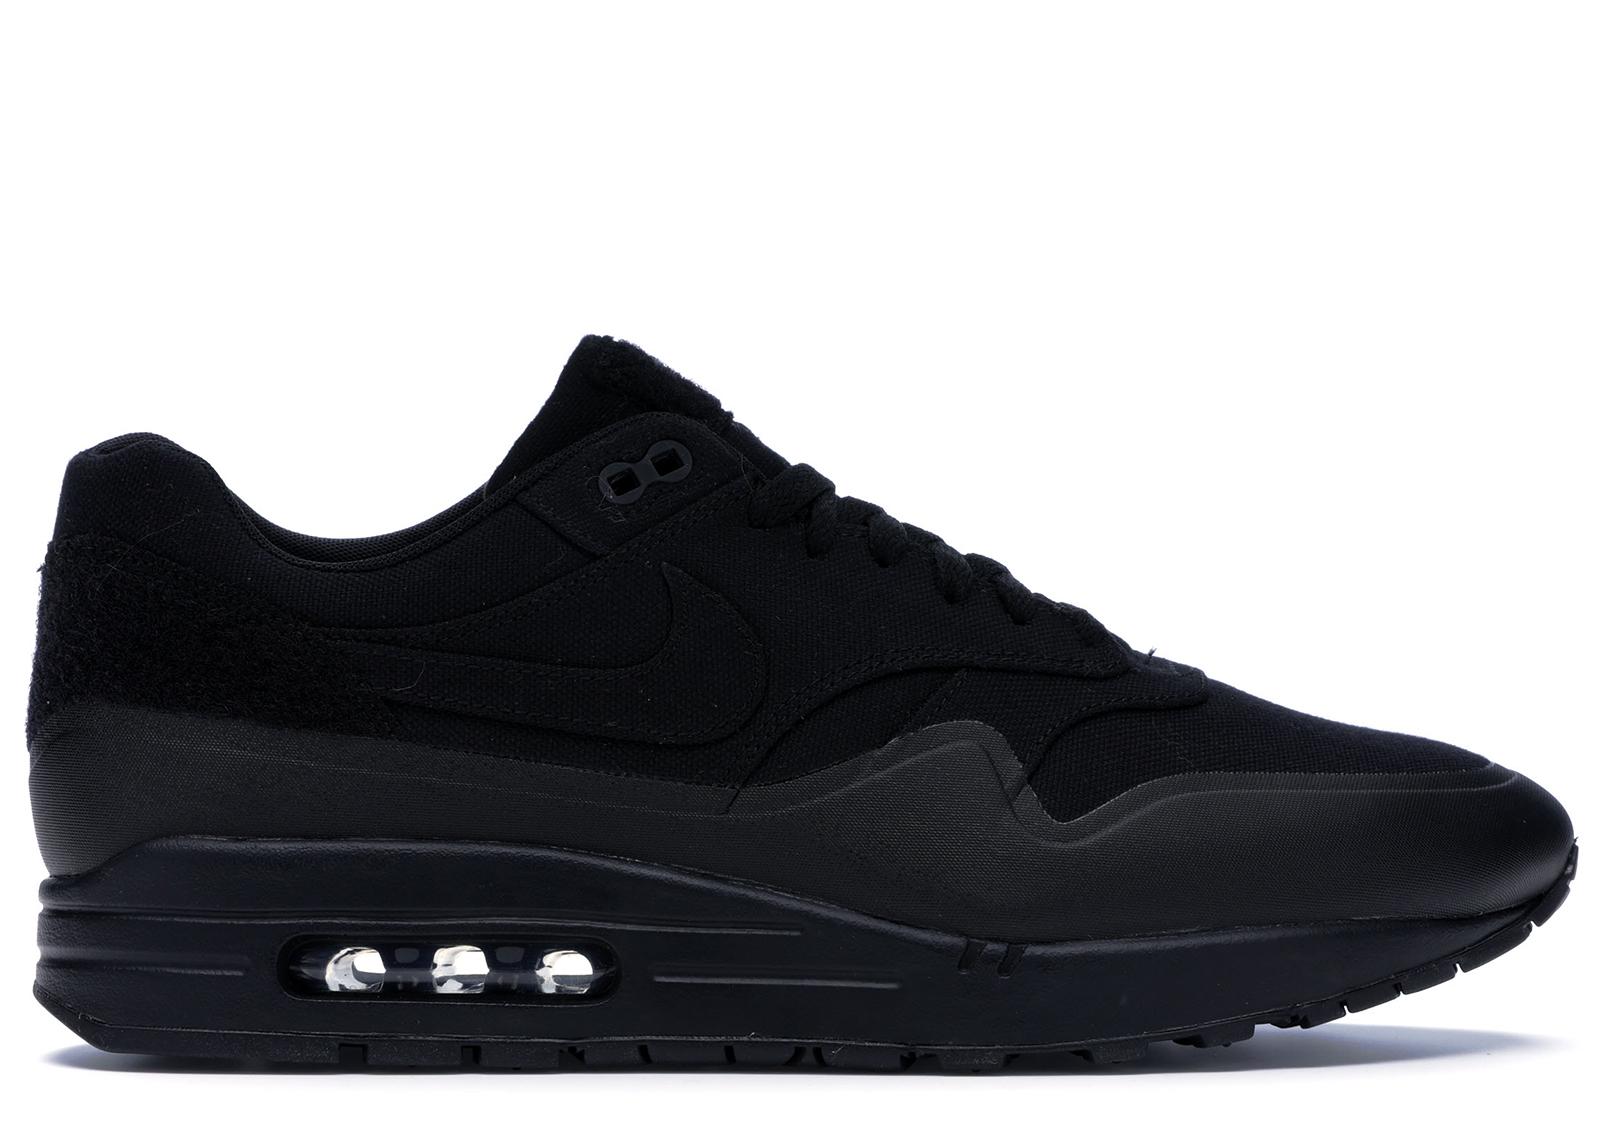 Nike Air Max 1 Patch Black - 704901-001